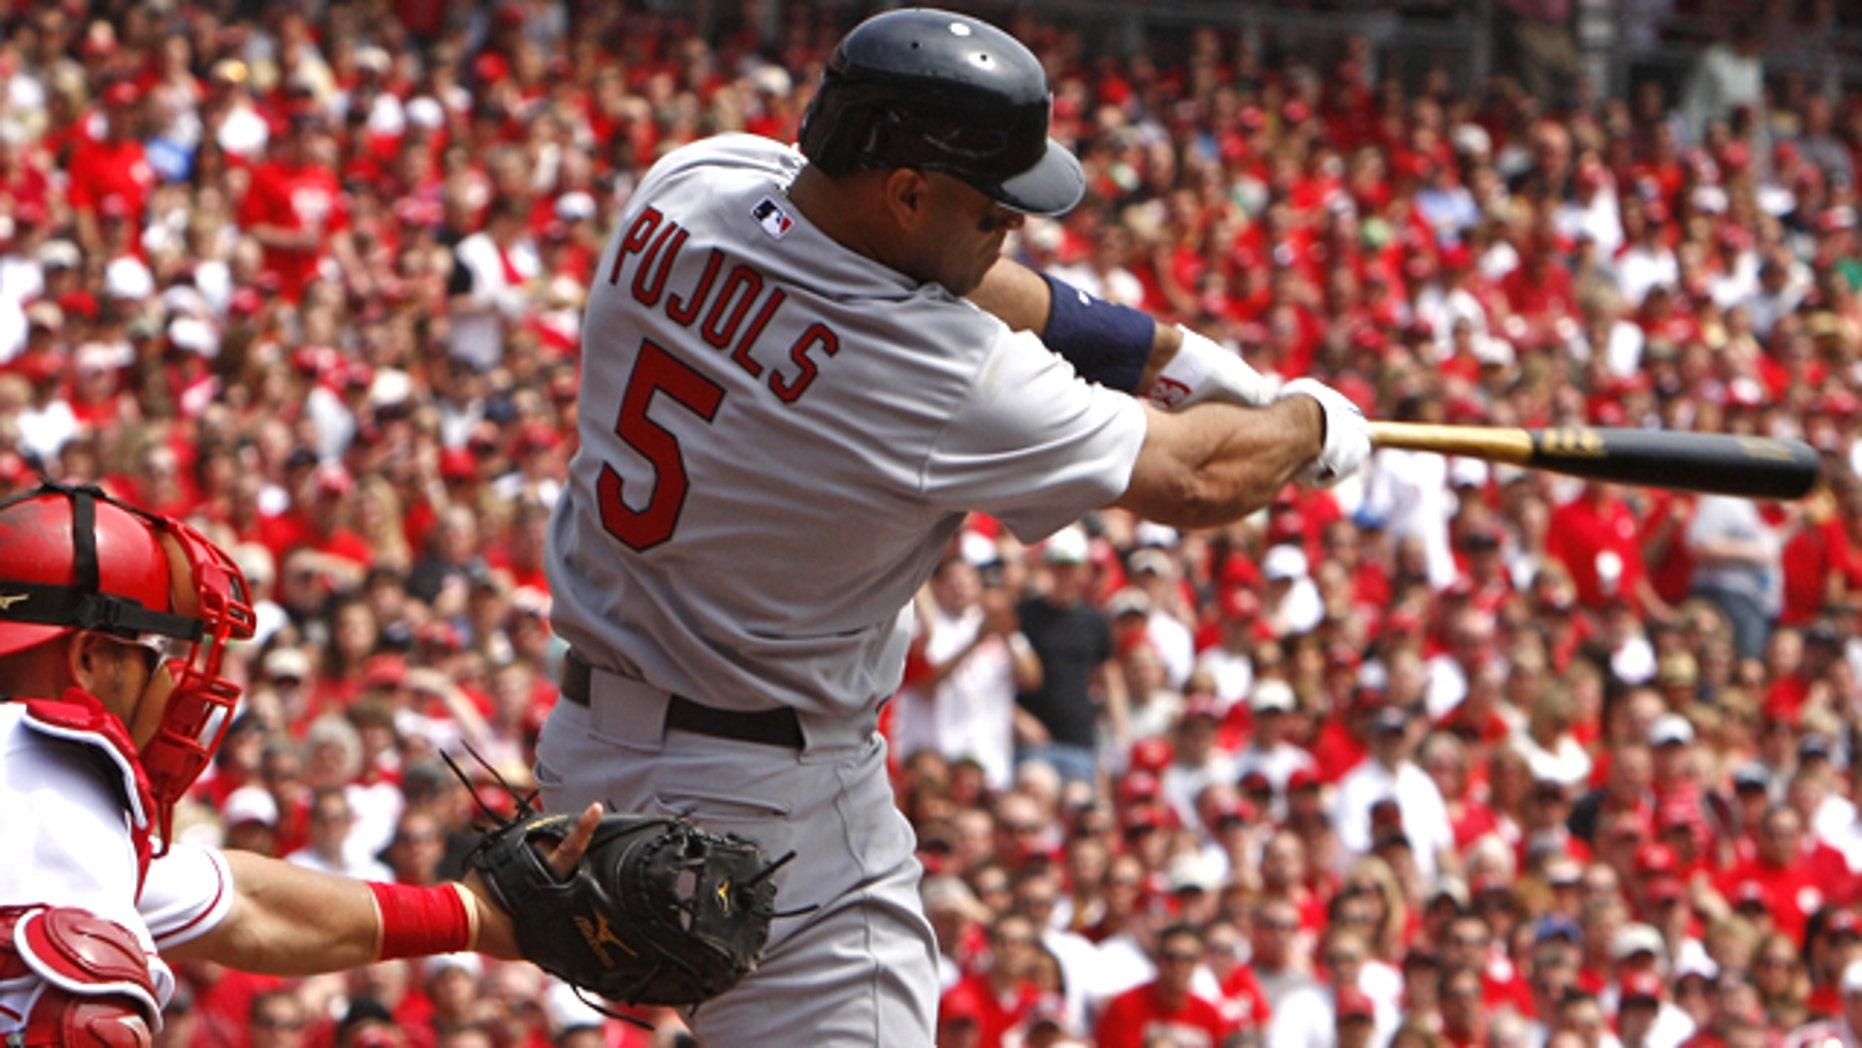 St. Louis Cardinals' Albert Pujols hits a solo home run off Cincinnati Reds pitcher Aaron Harang in the first inning of a baseball game, Monday, April 5, 2010, in Cincinnati. Cincinnati Reds' Ramon Hernandez catches at left.